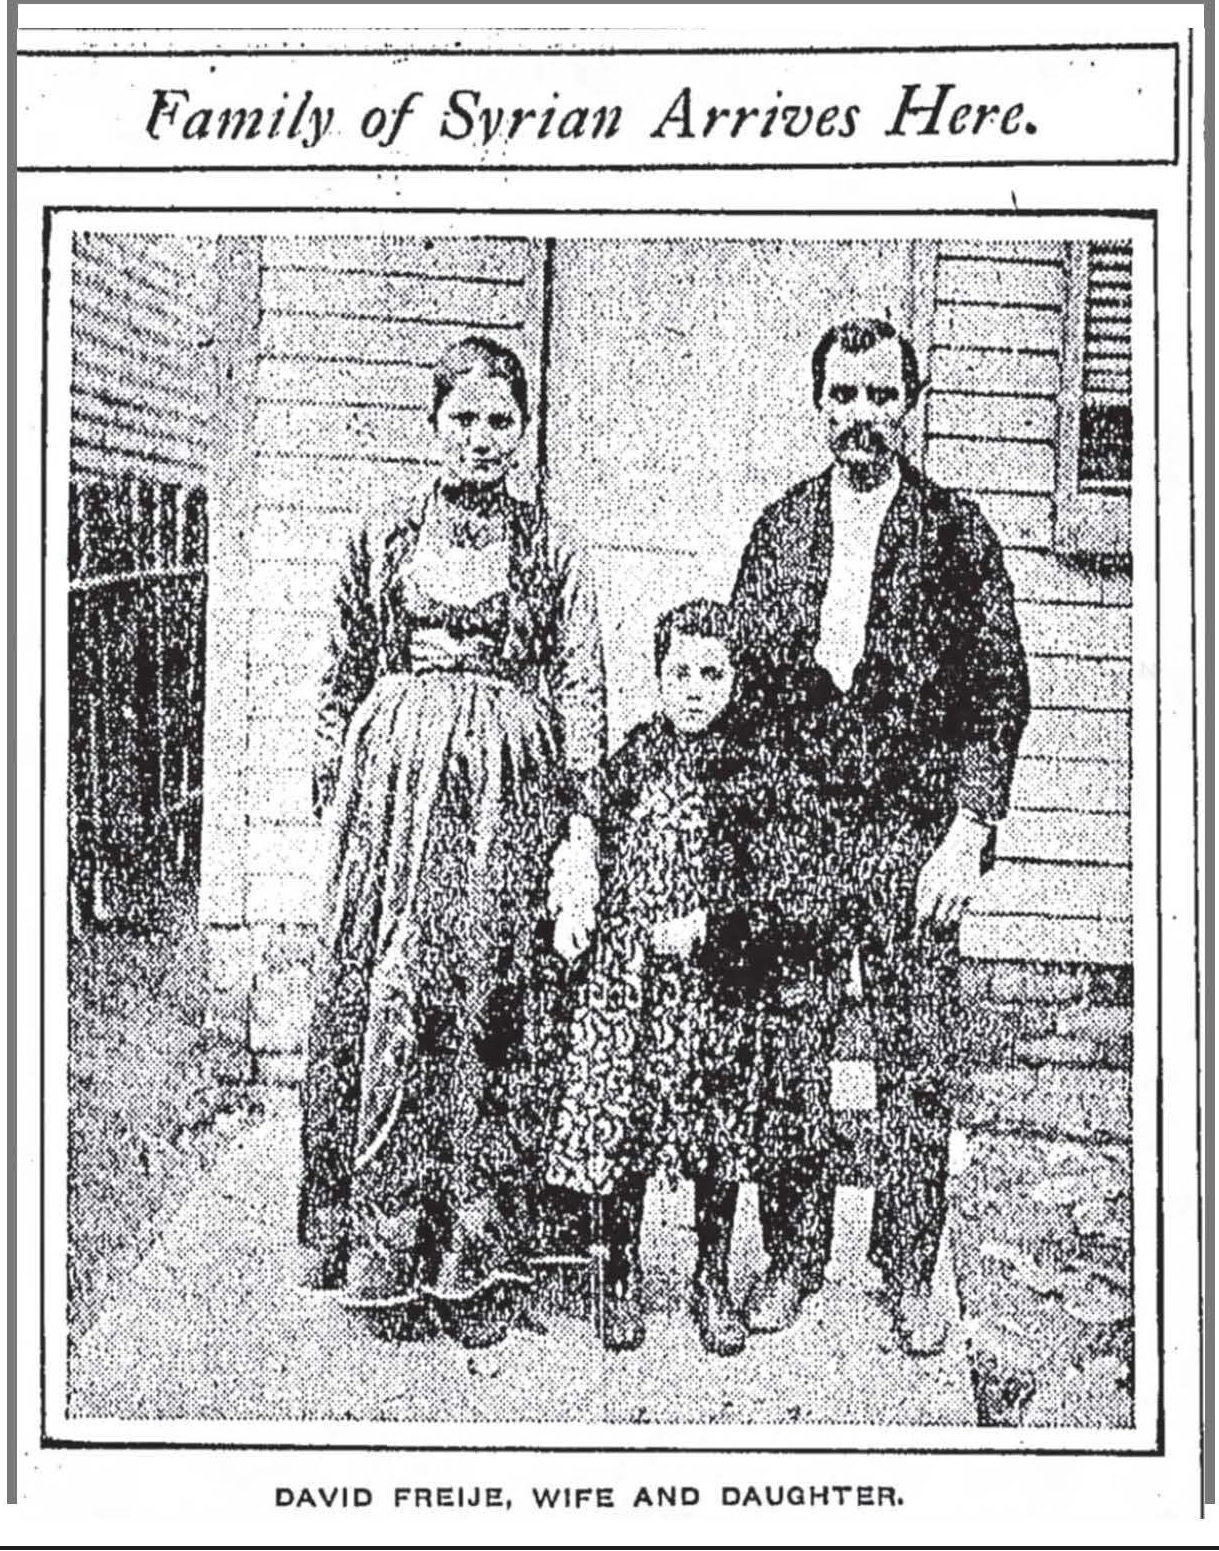 David Freije and Family